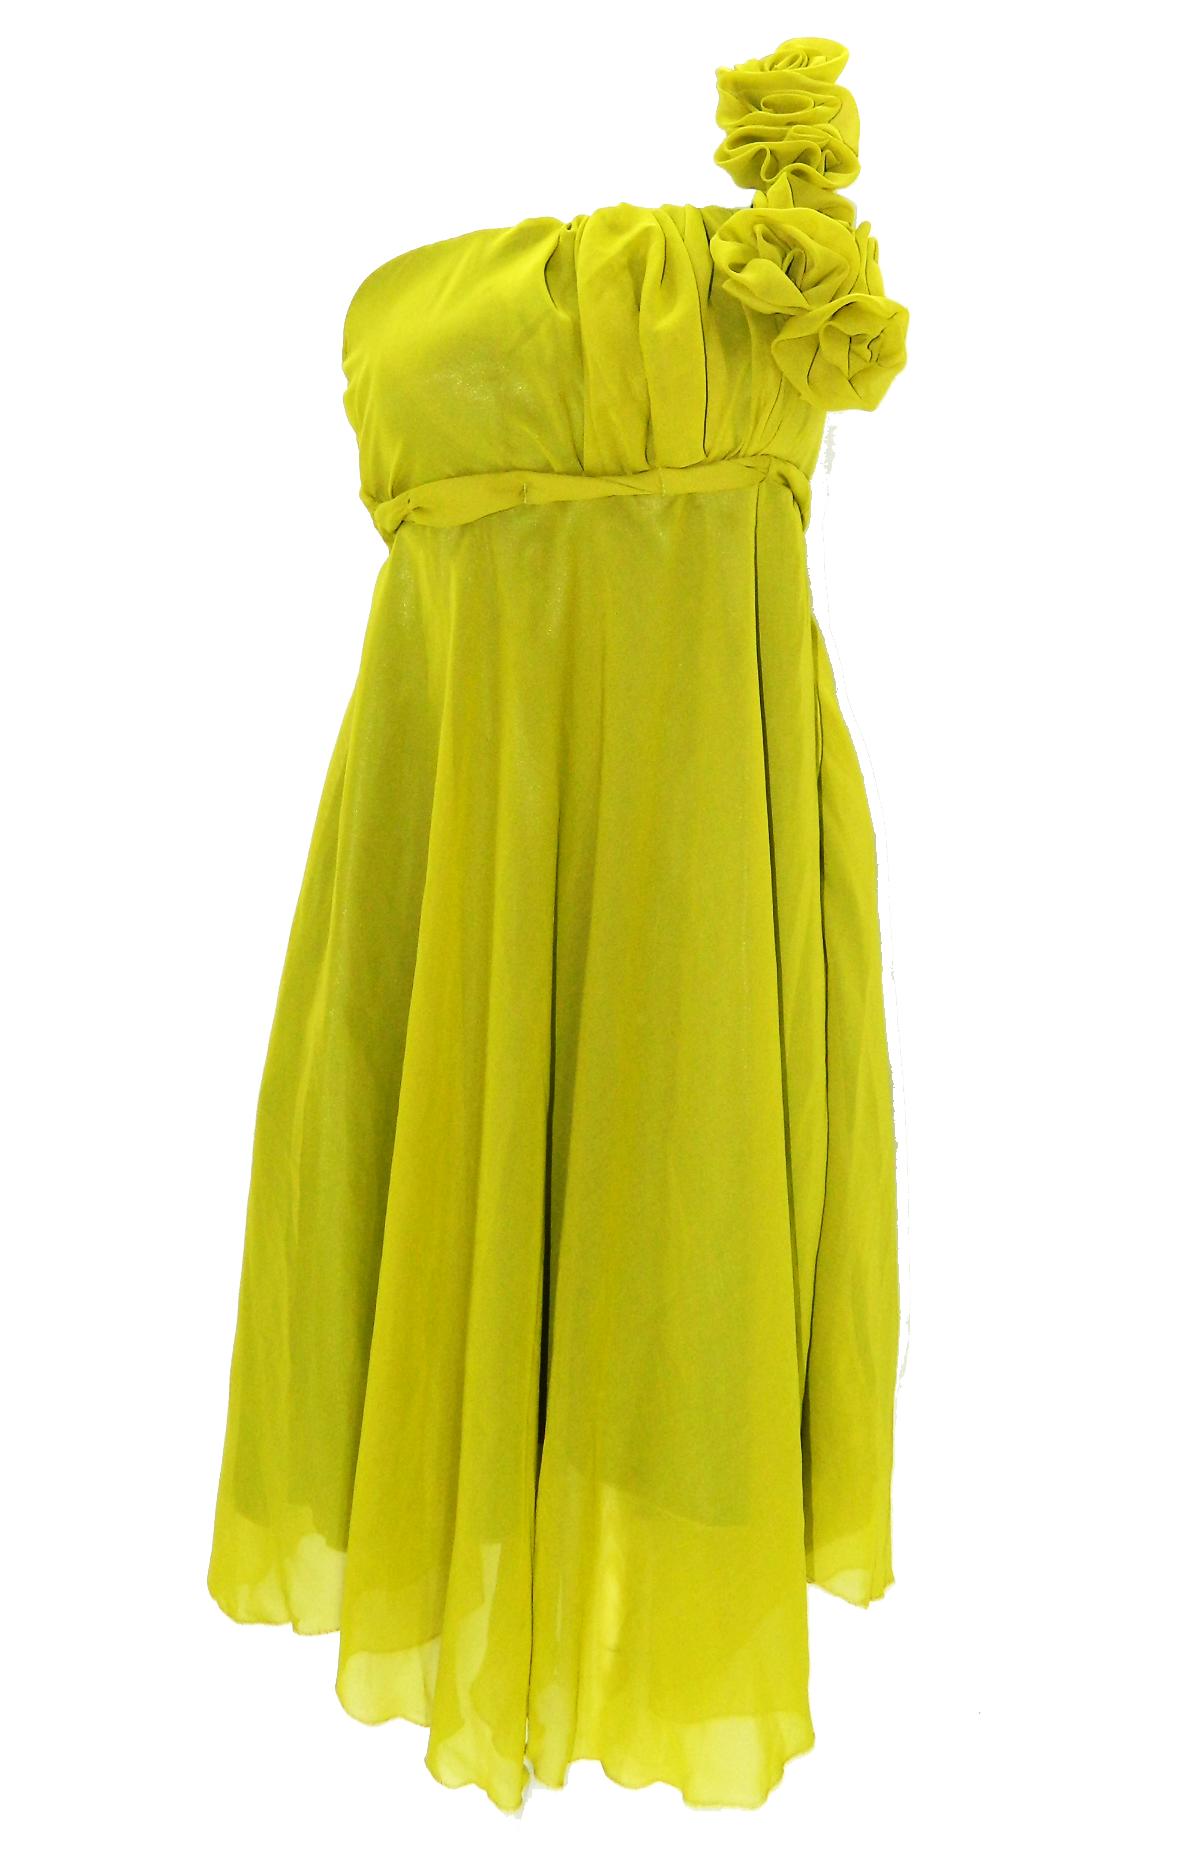 Dress PNG - 18731